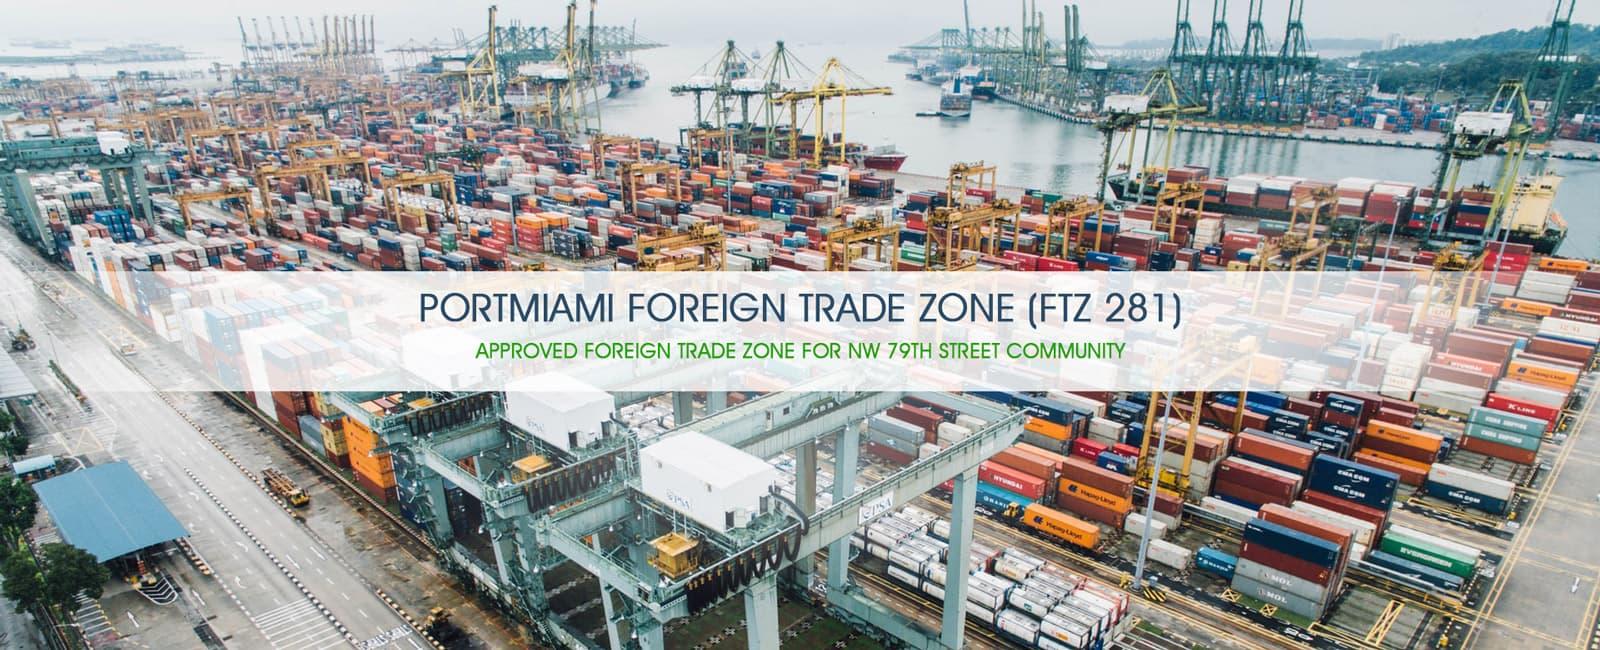 Port Miami FTZ-281